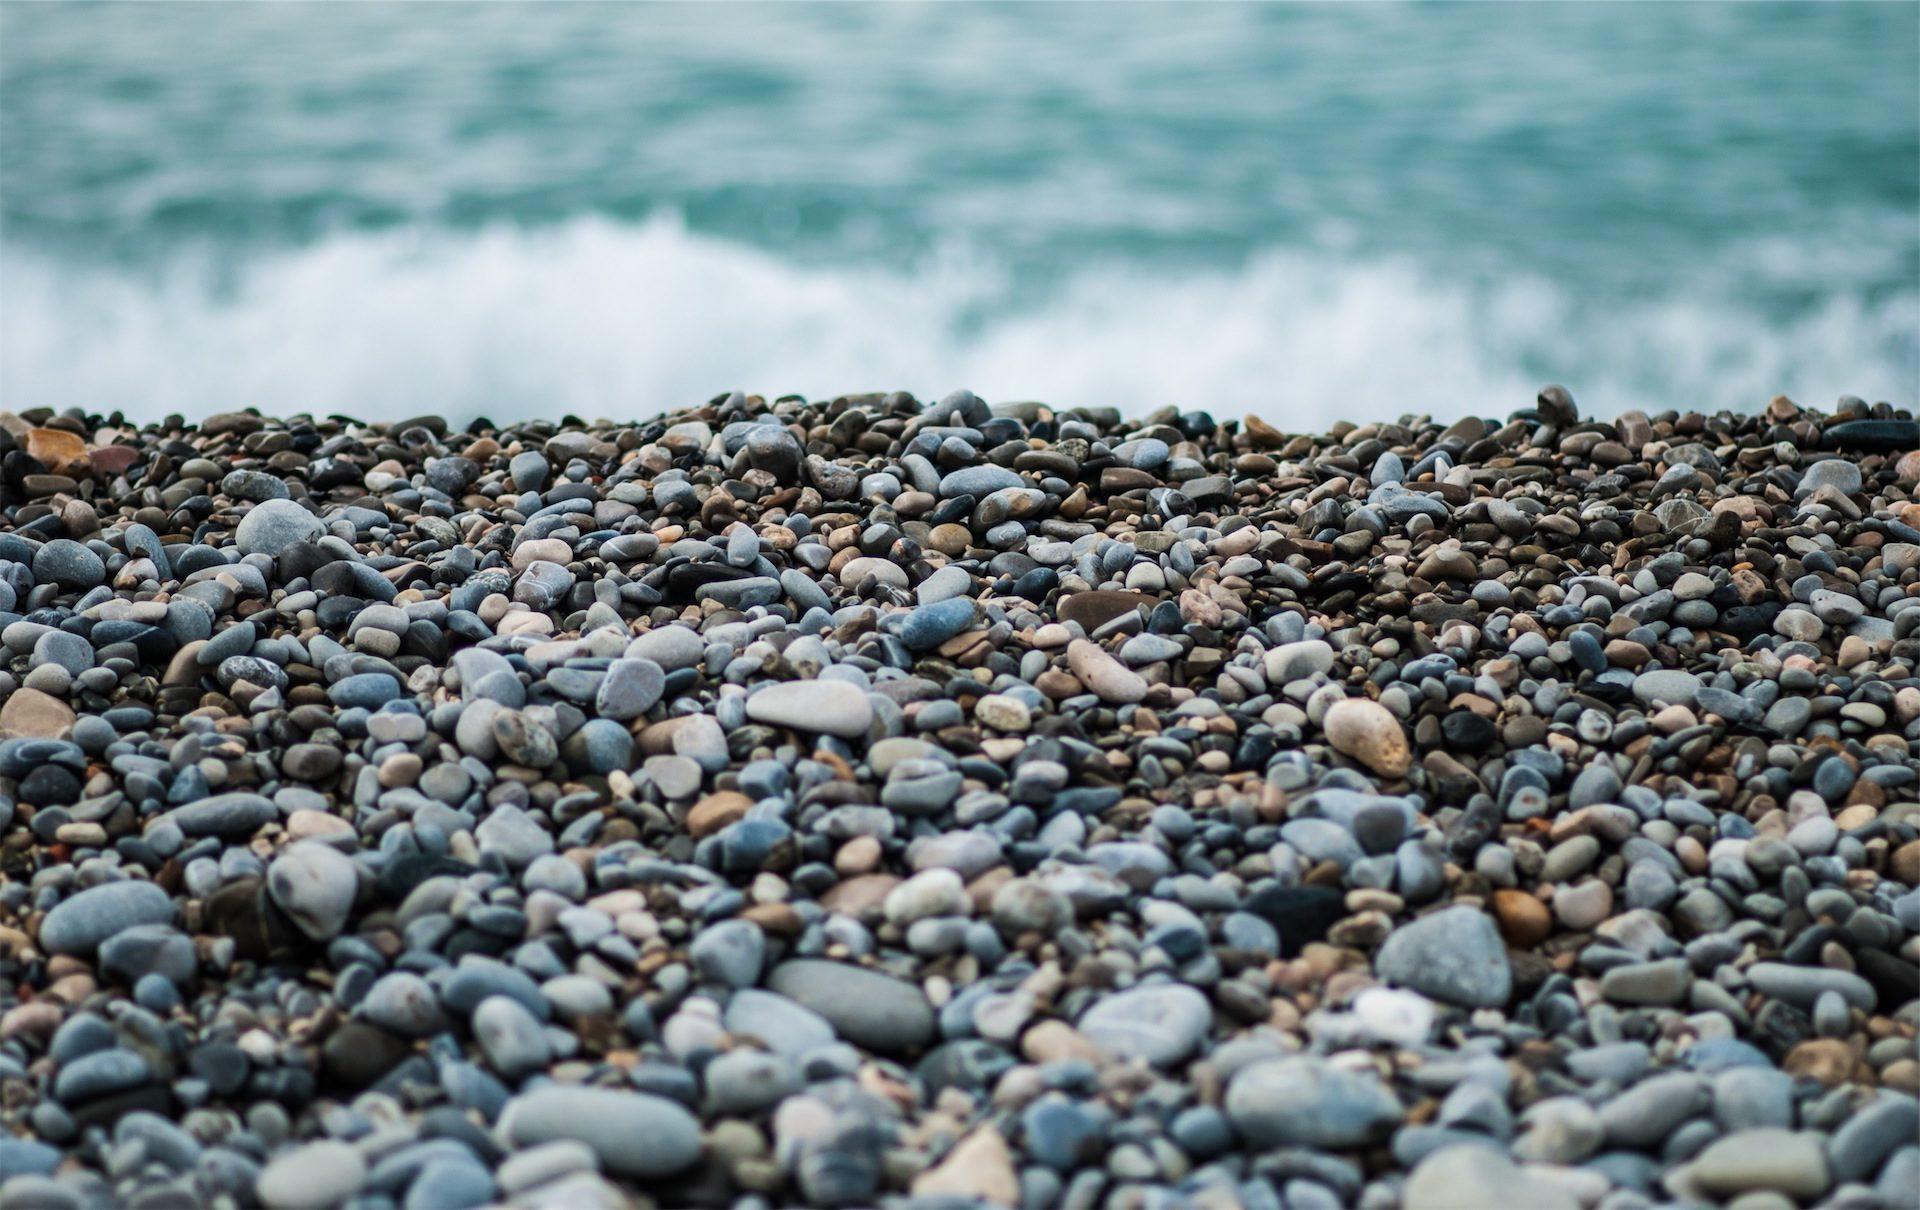 Stein, Strand, Wasser, Meer, Ufer - Wallpaper HD - Prof.-falken.com